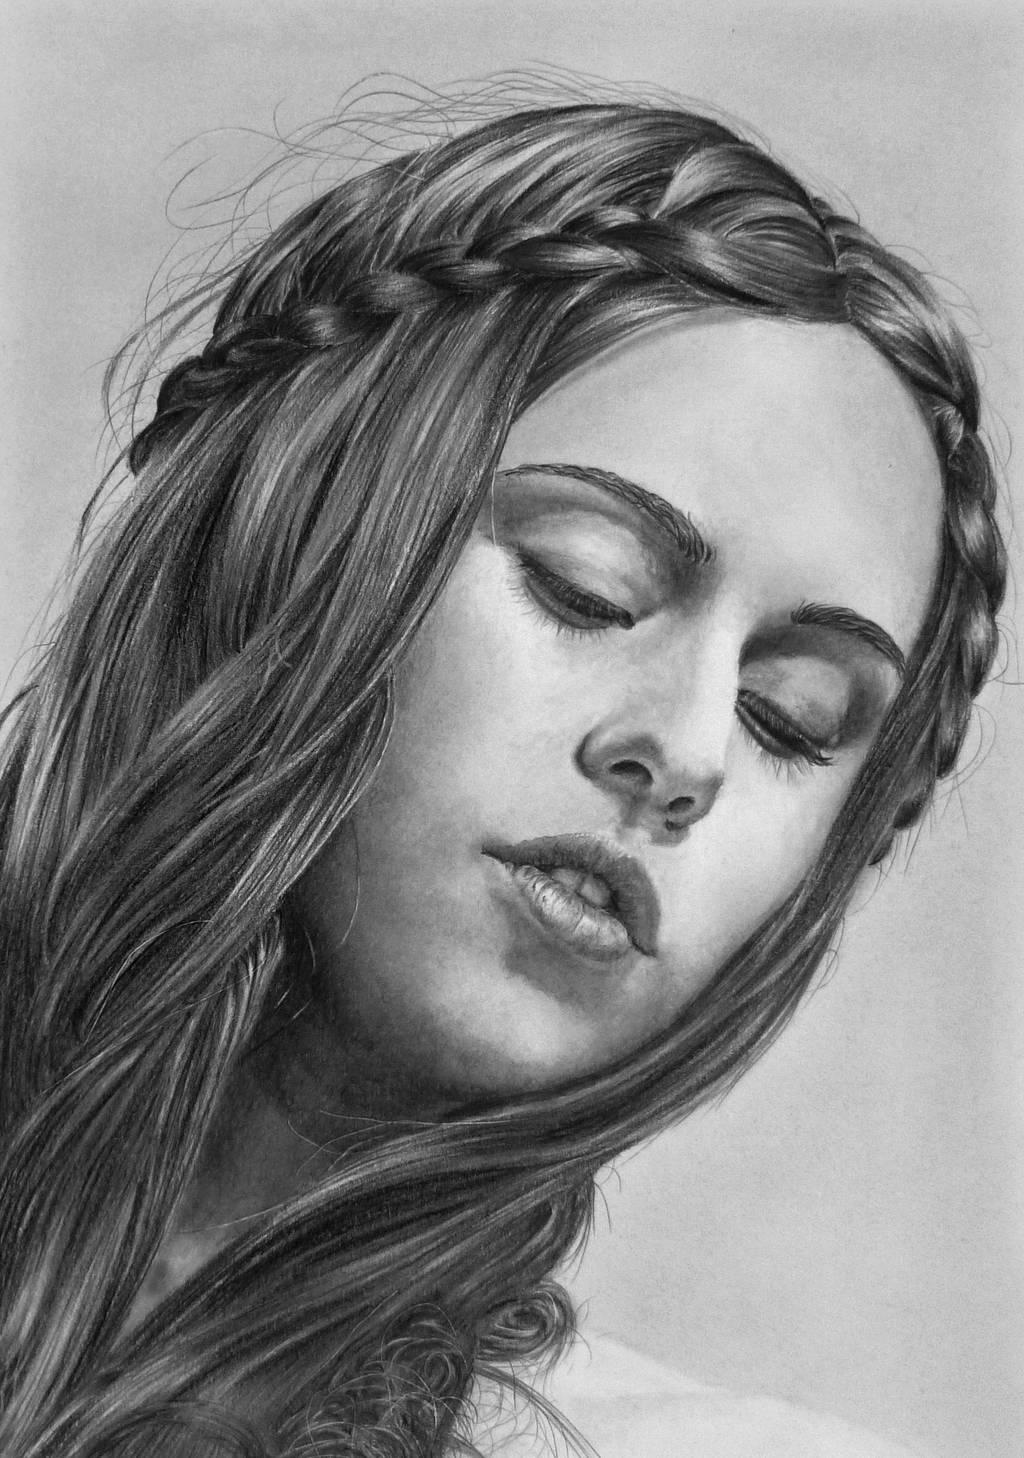 Pencil portrait of Jessica by LateStarter63